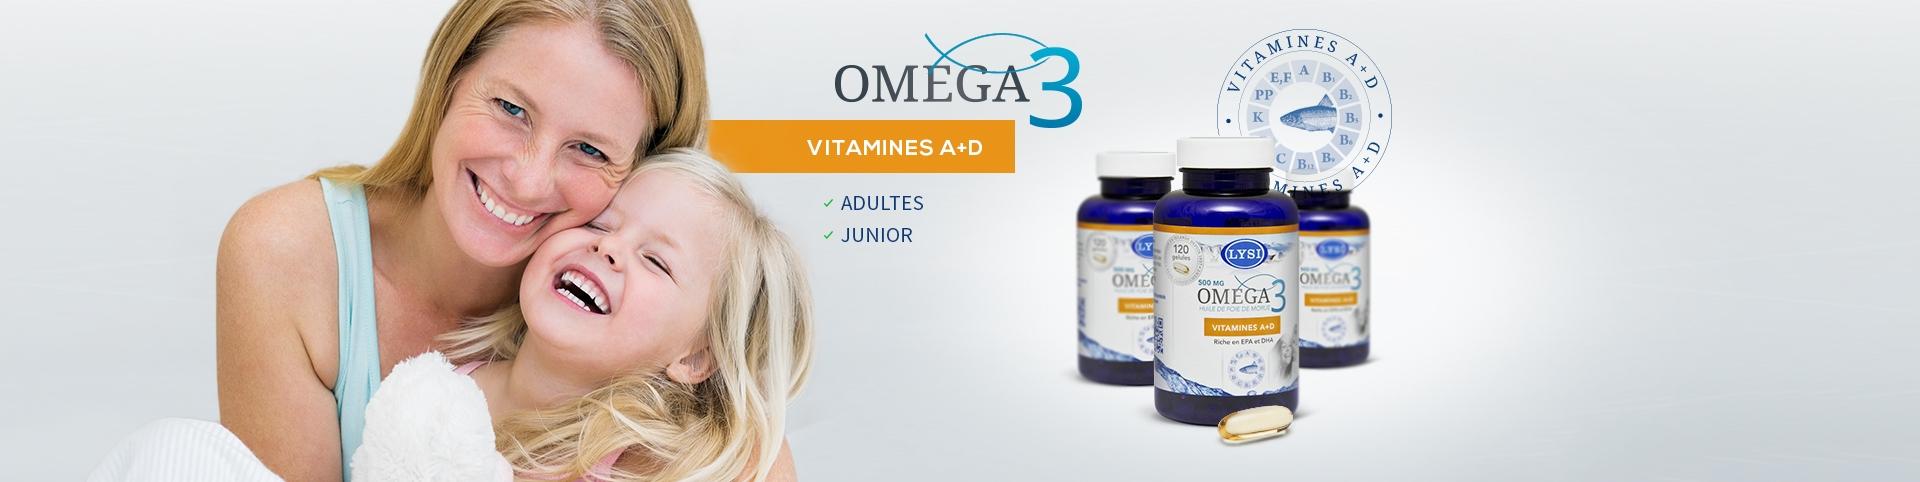 Huile de foie de morue Omega 3 vitamine A et D